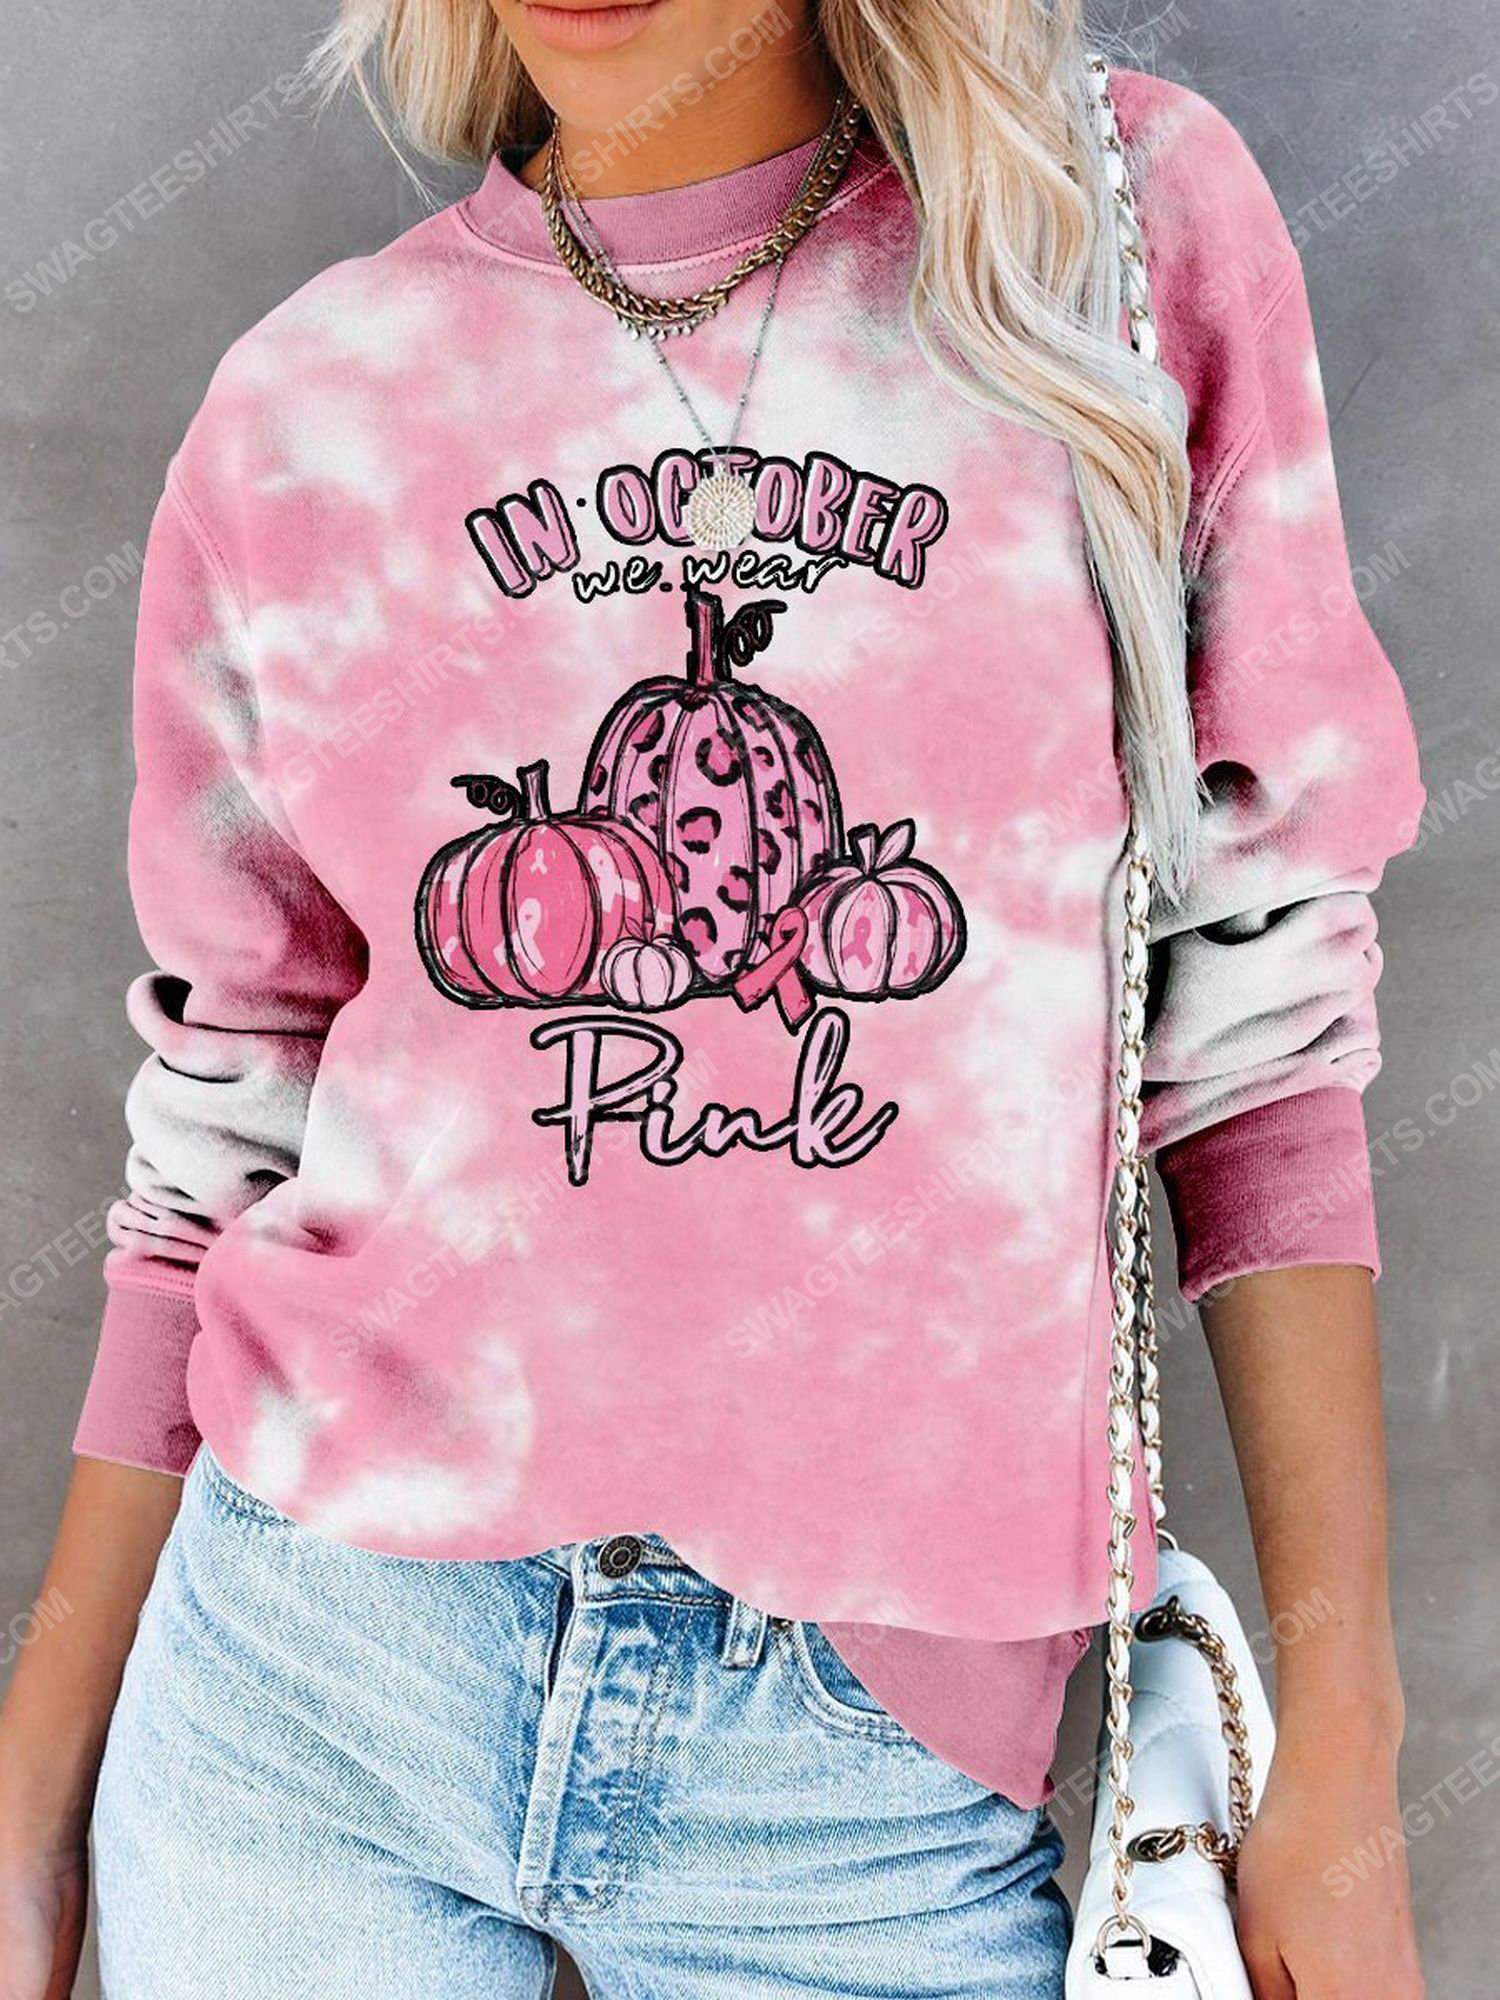 Breast cancer awareness in october we wear pink pumpkin leopard tie dye shirt